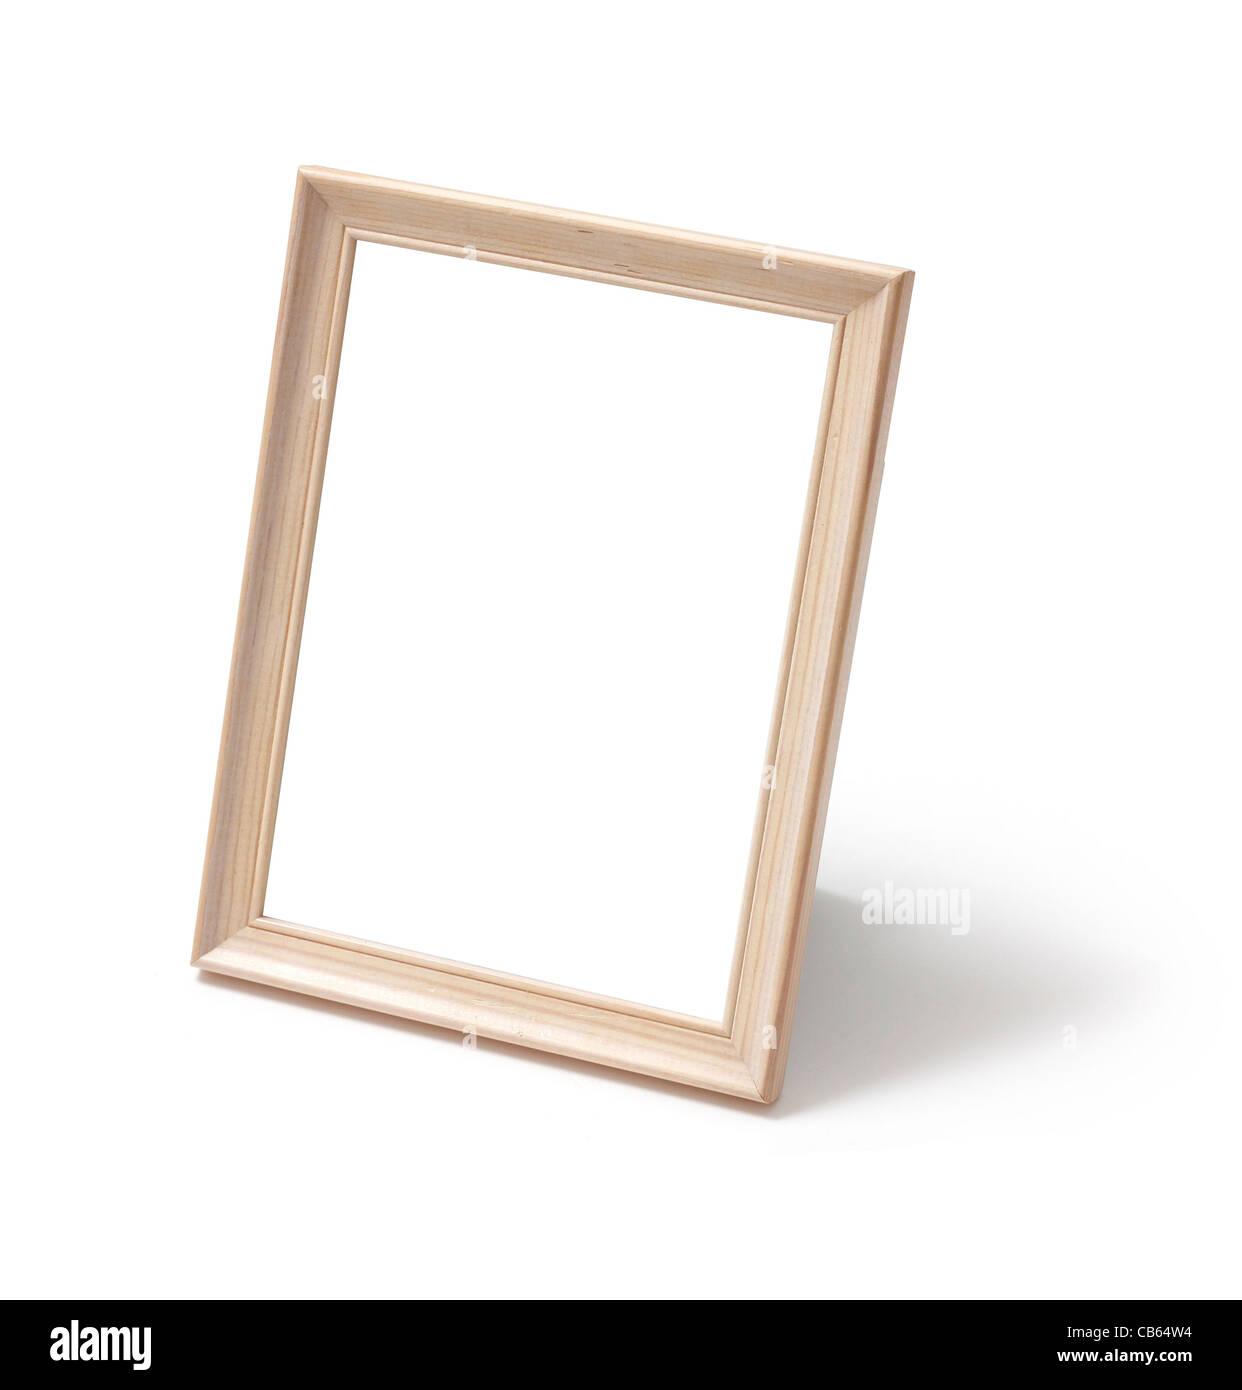 Photo frame standing Stock Photo: 41317504 - Alamy